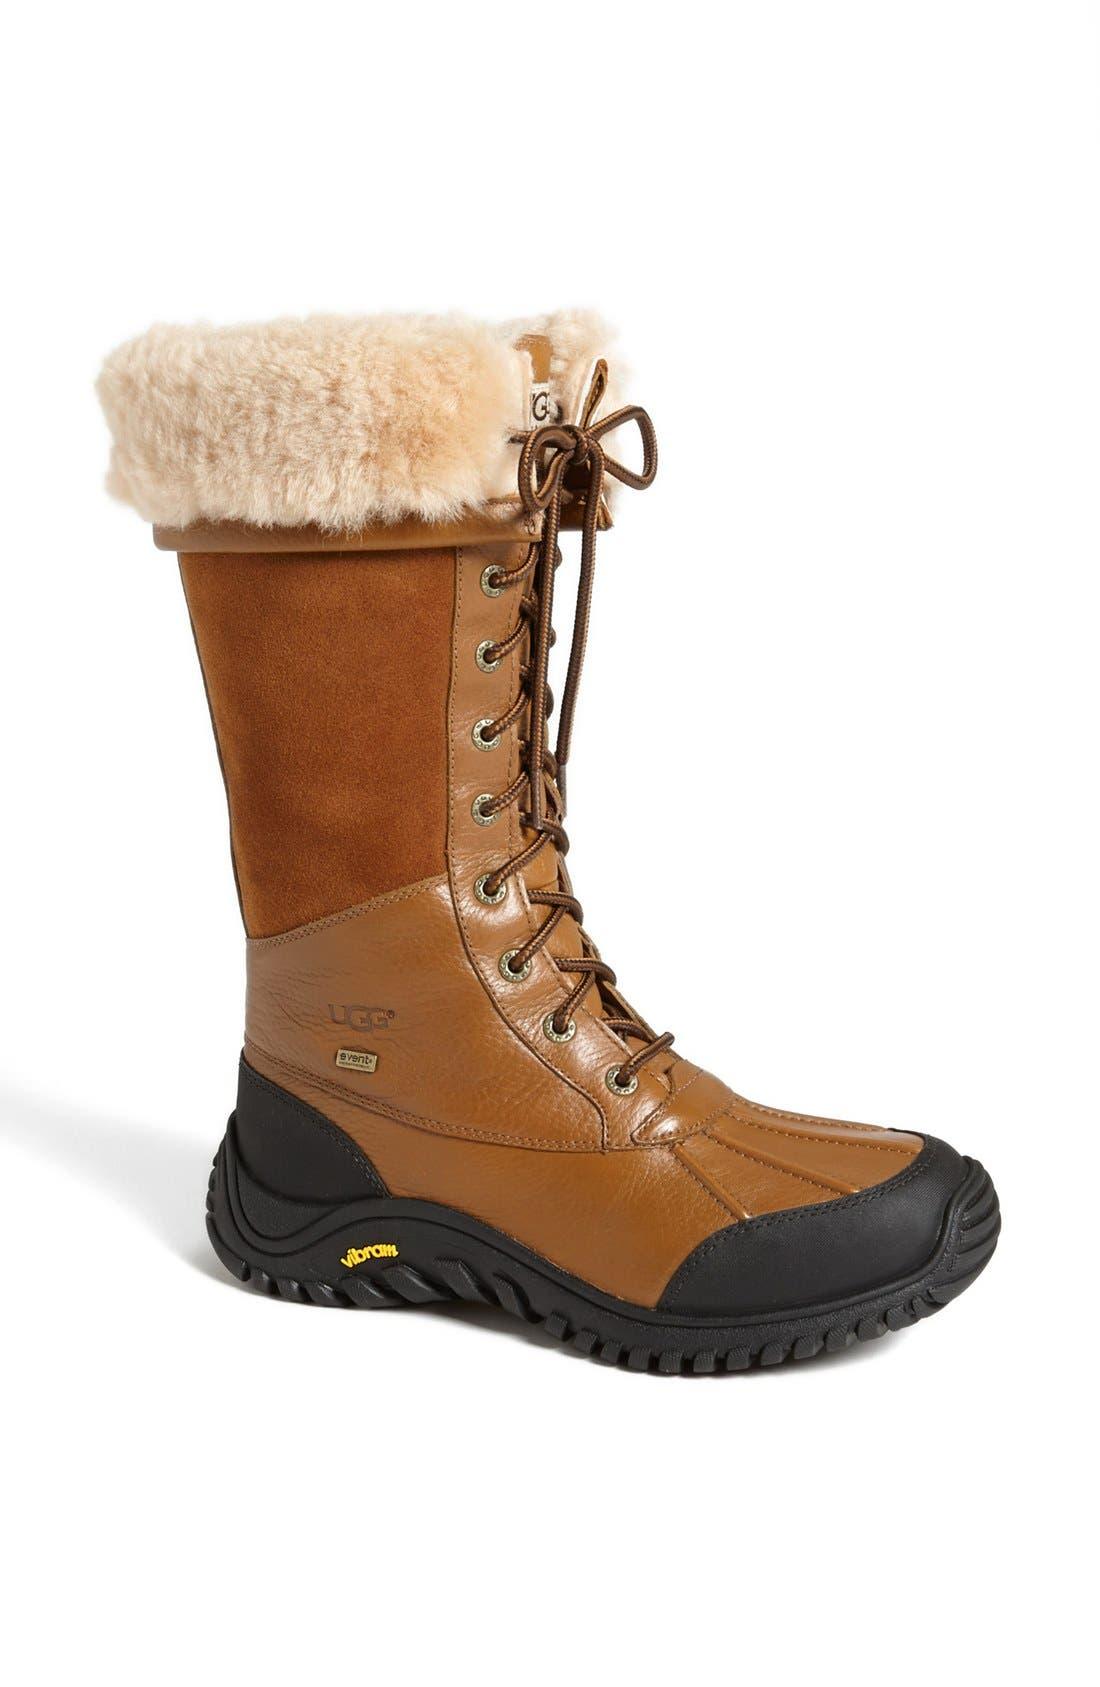 Alternate Image 1 Selected - UGG® Adirondack Waterproof Tall Boot (Women)